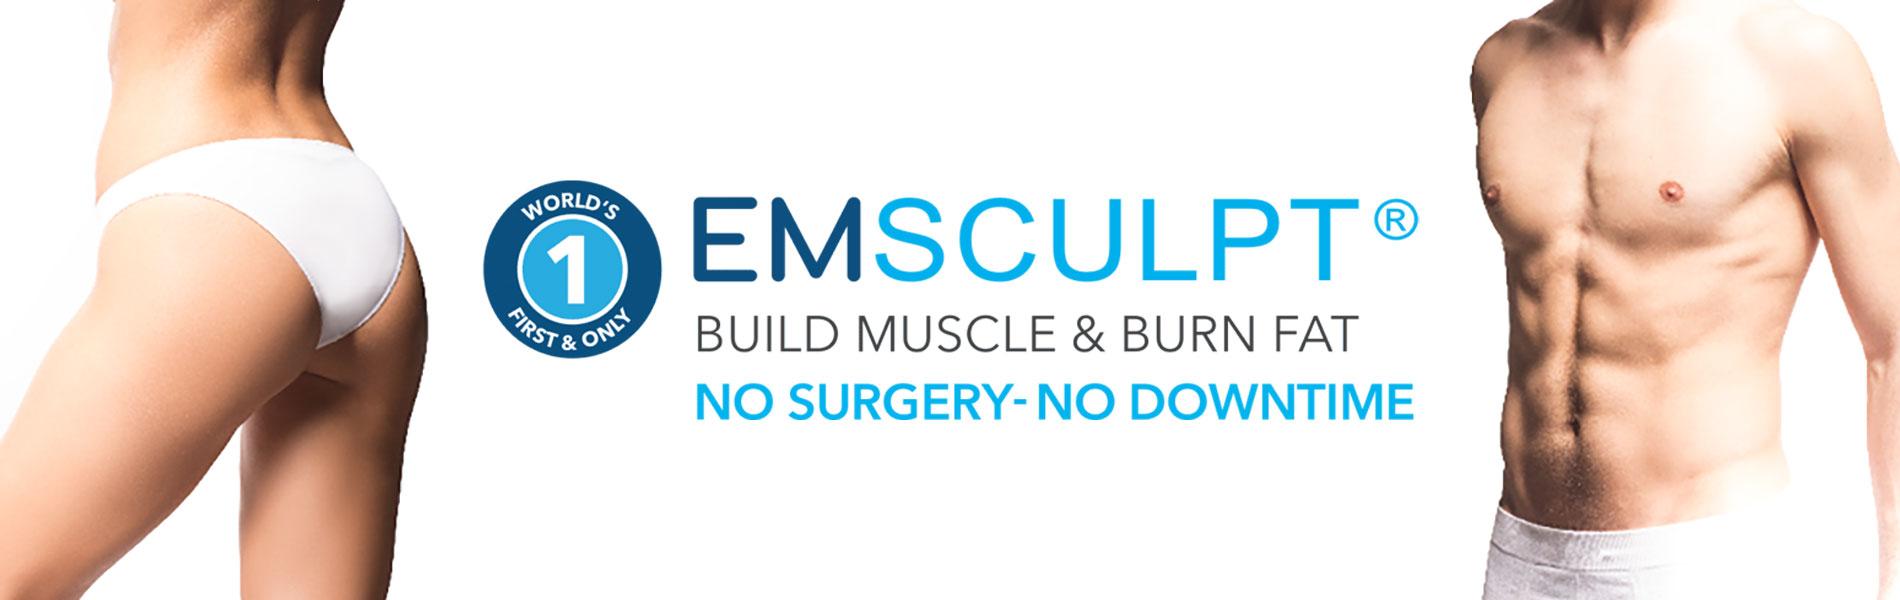 EMSCULPT Non-Surgical Body Sculpting Treatments at CJA Aesthetics Southampton & Winchester